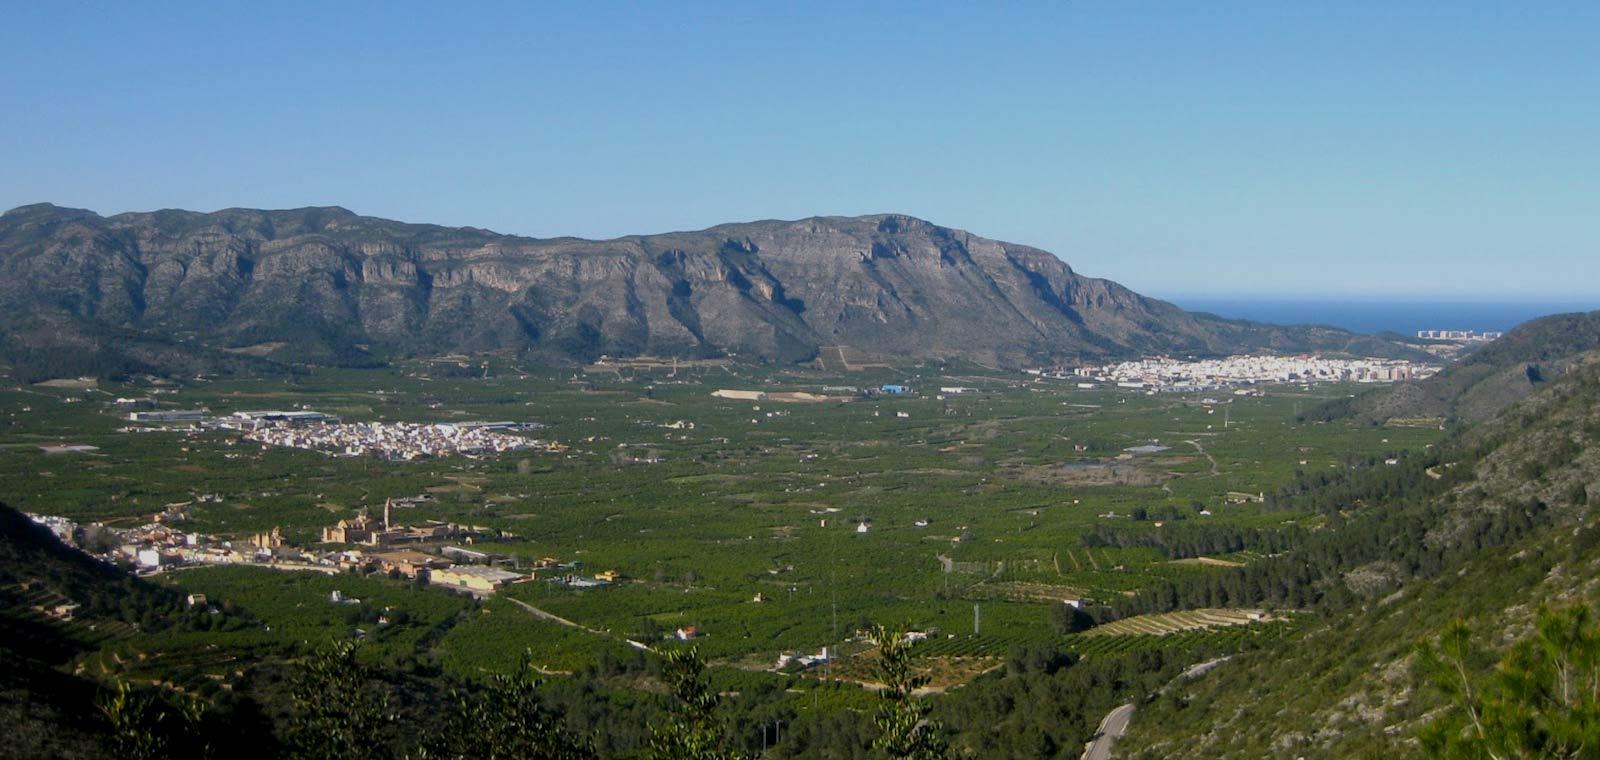 La Vall de Valldigna